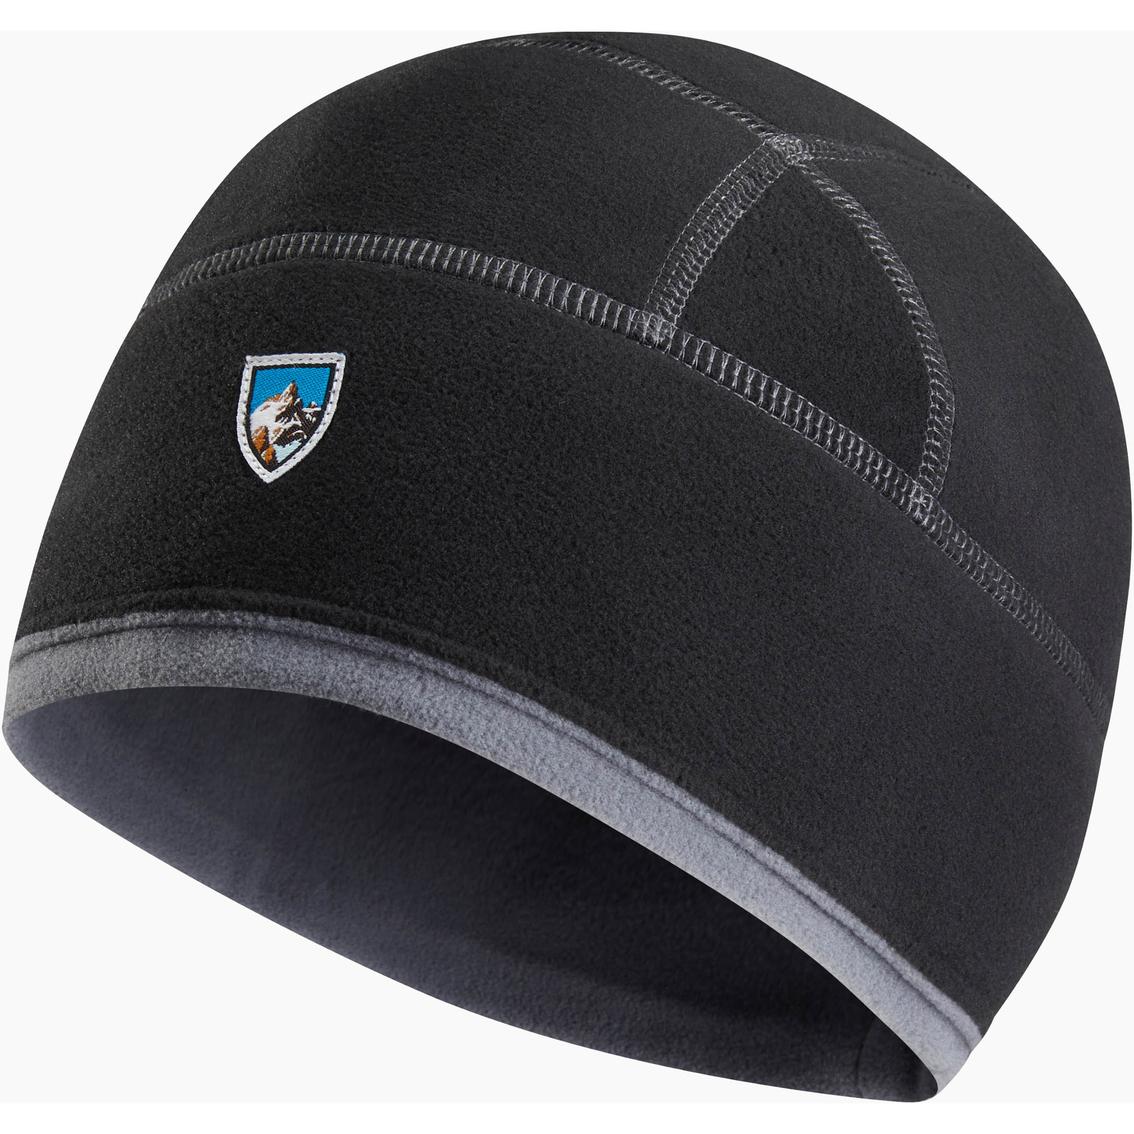 c3ba0c76da8 Kuhl Skull Cap Fleece Hat